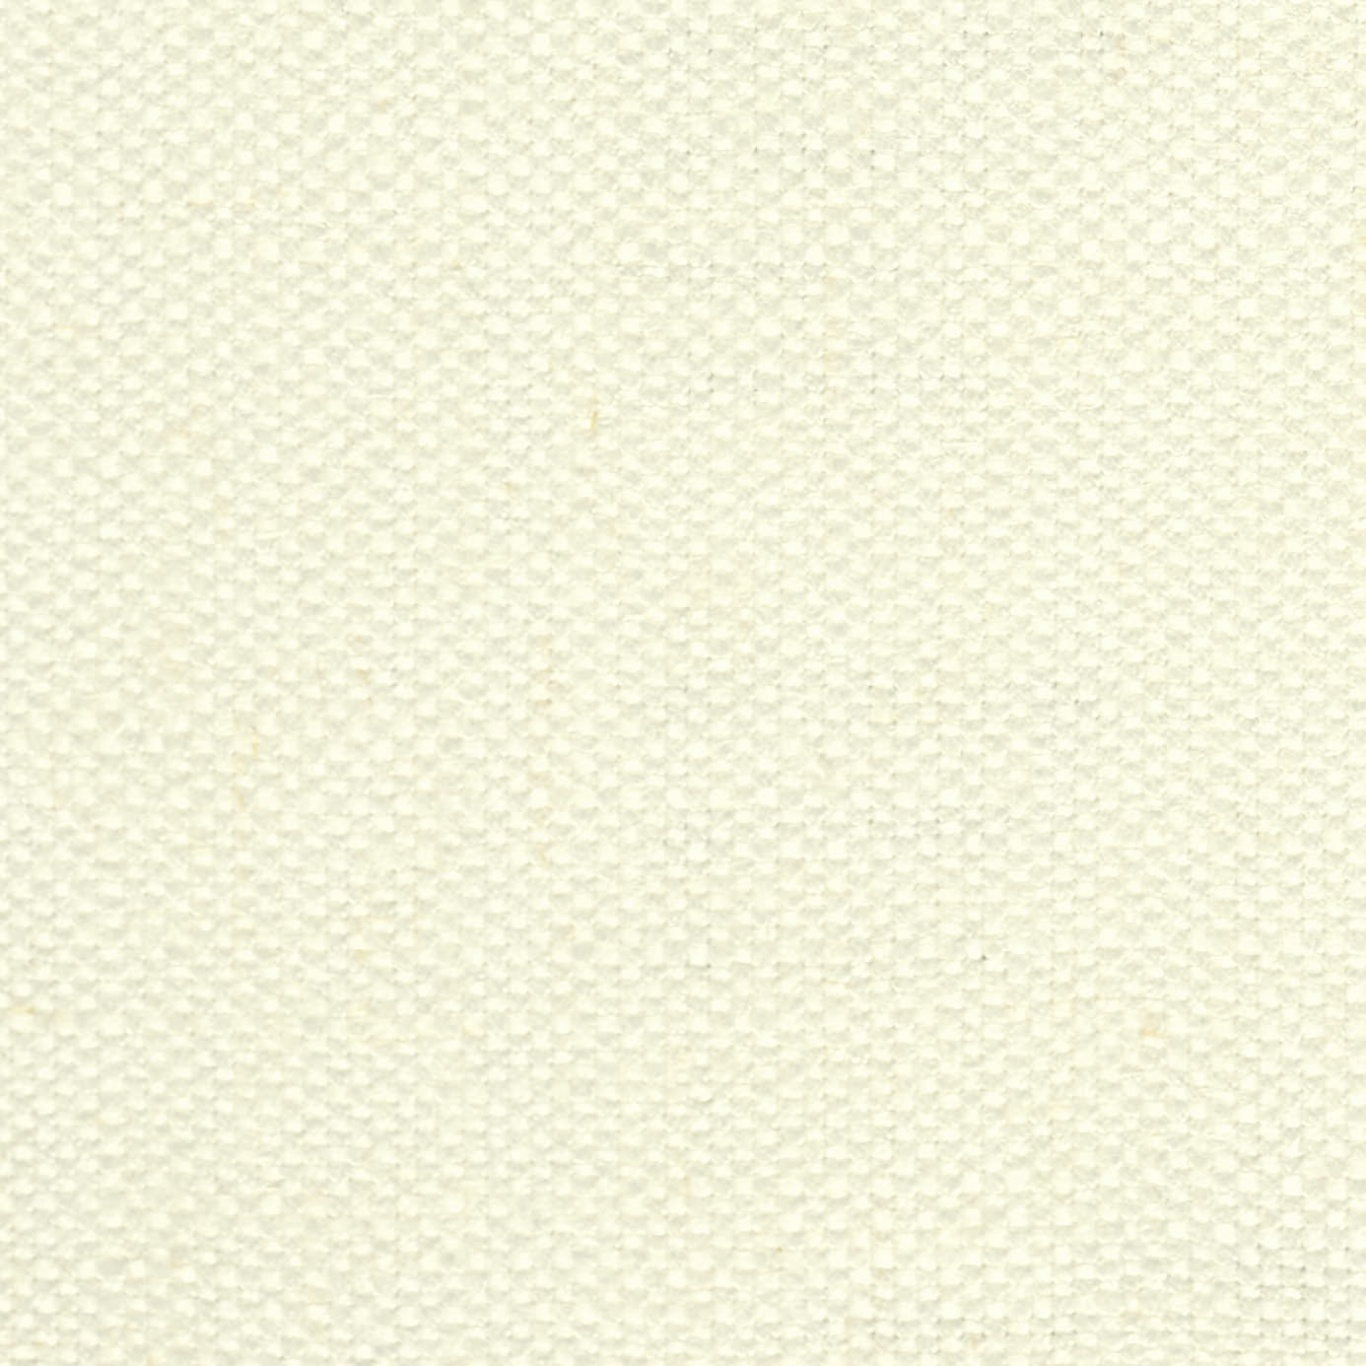 Image of Harlequin Atom Pearl Fabric 440301